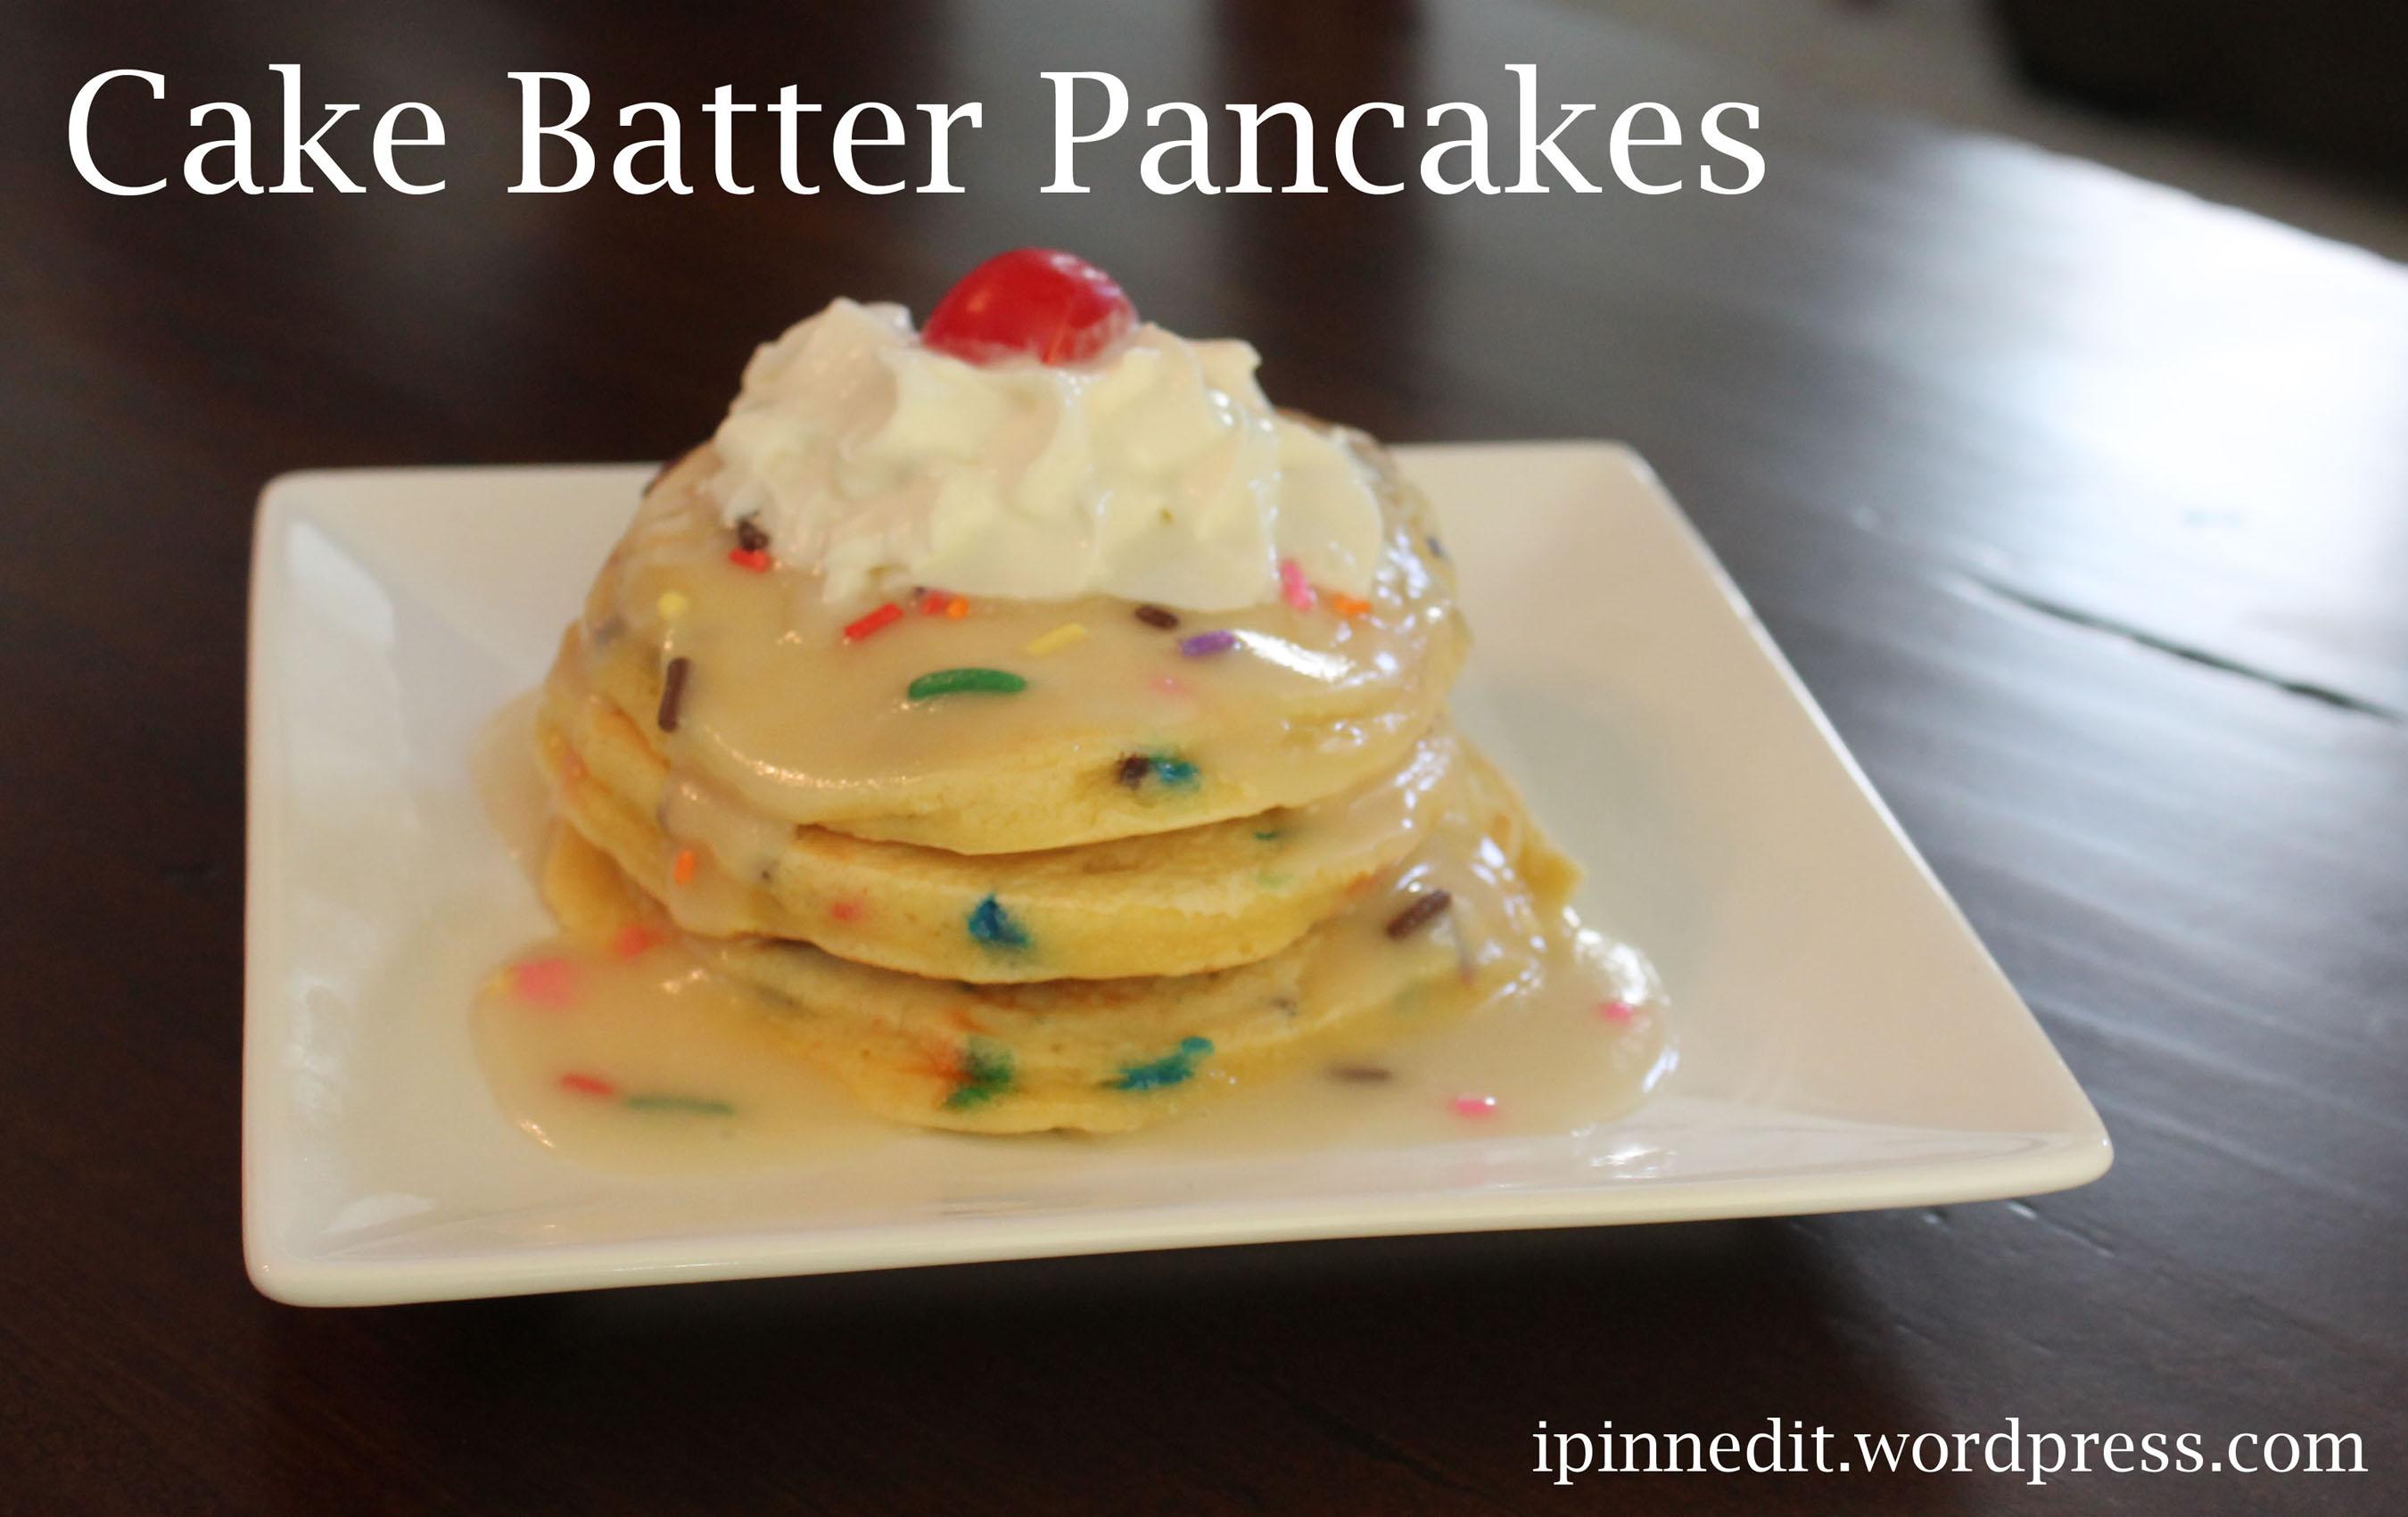 Cake Batter Pancakes (1) copy